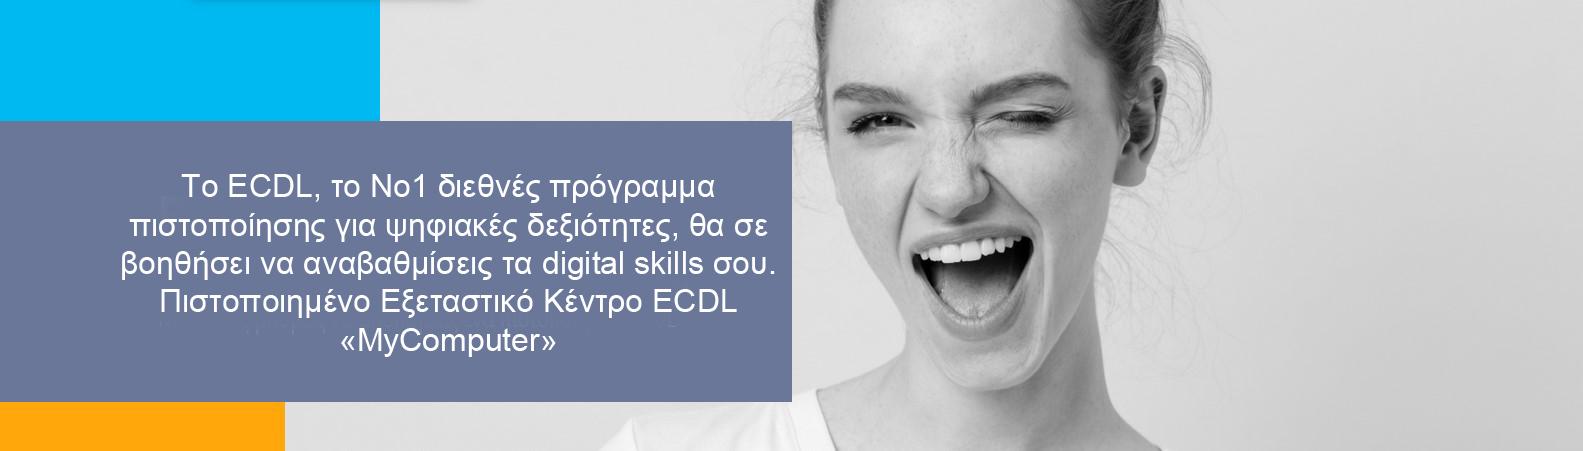 ecdl_mycomputer